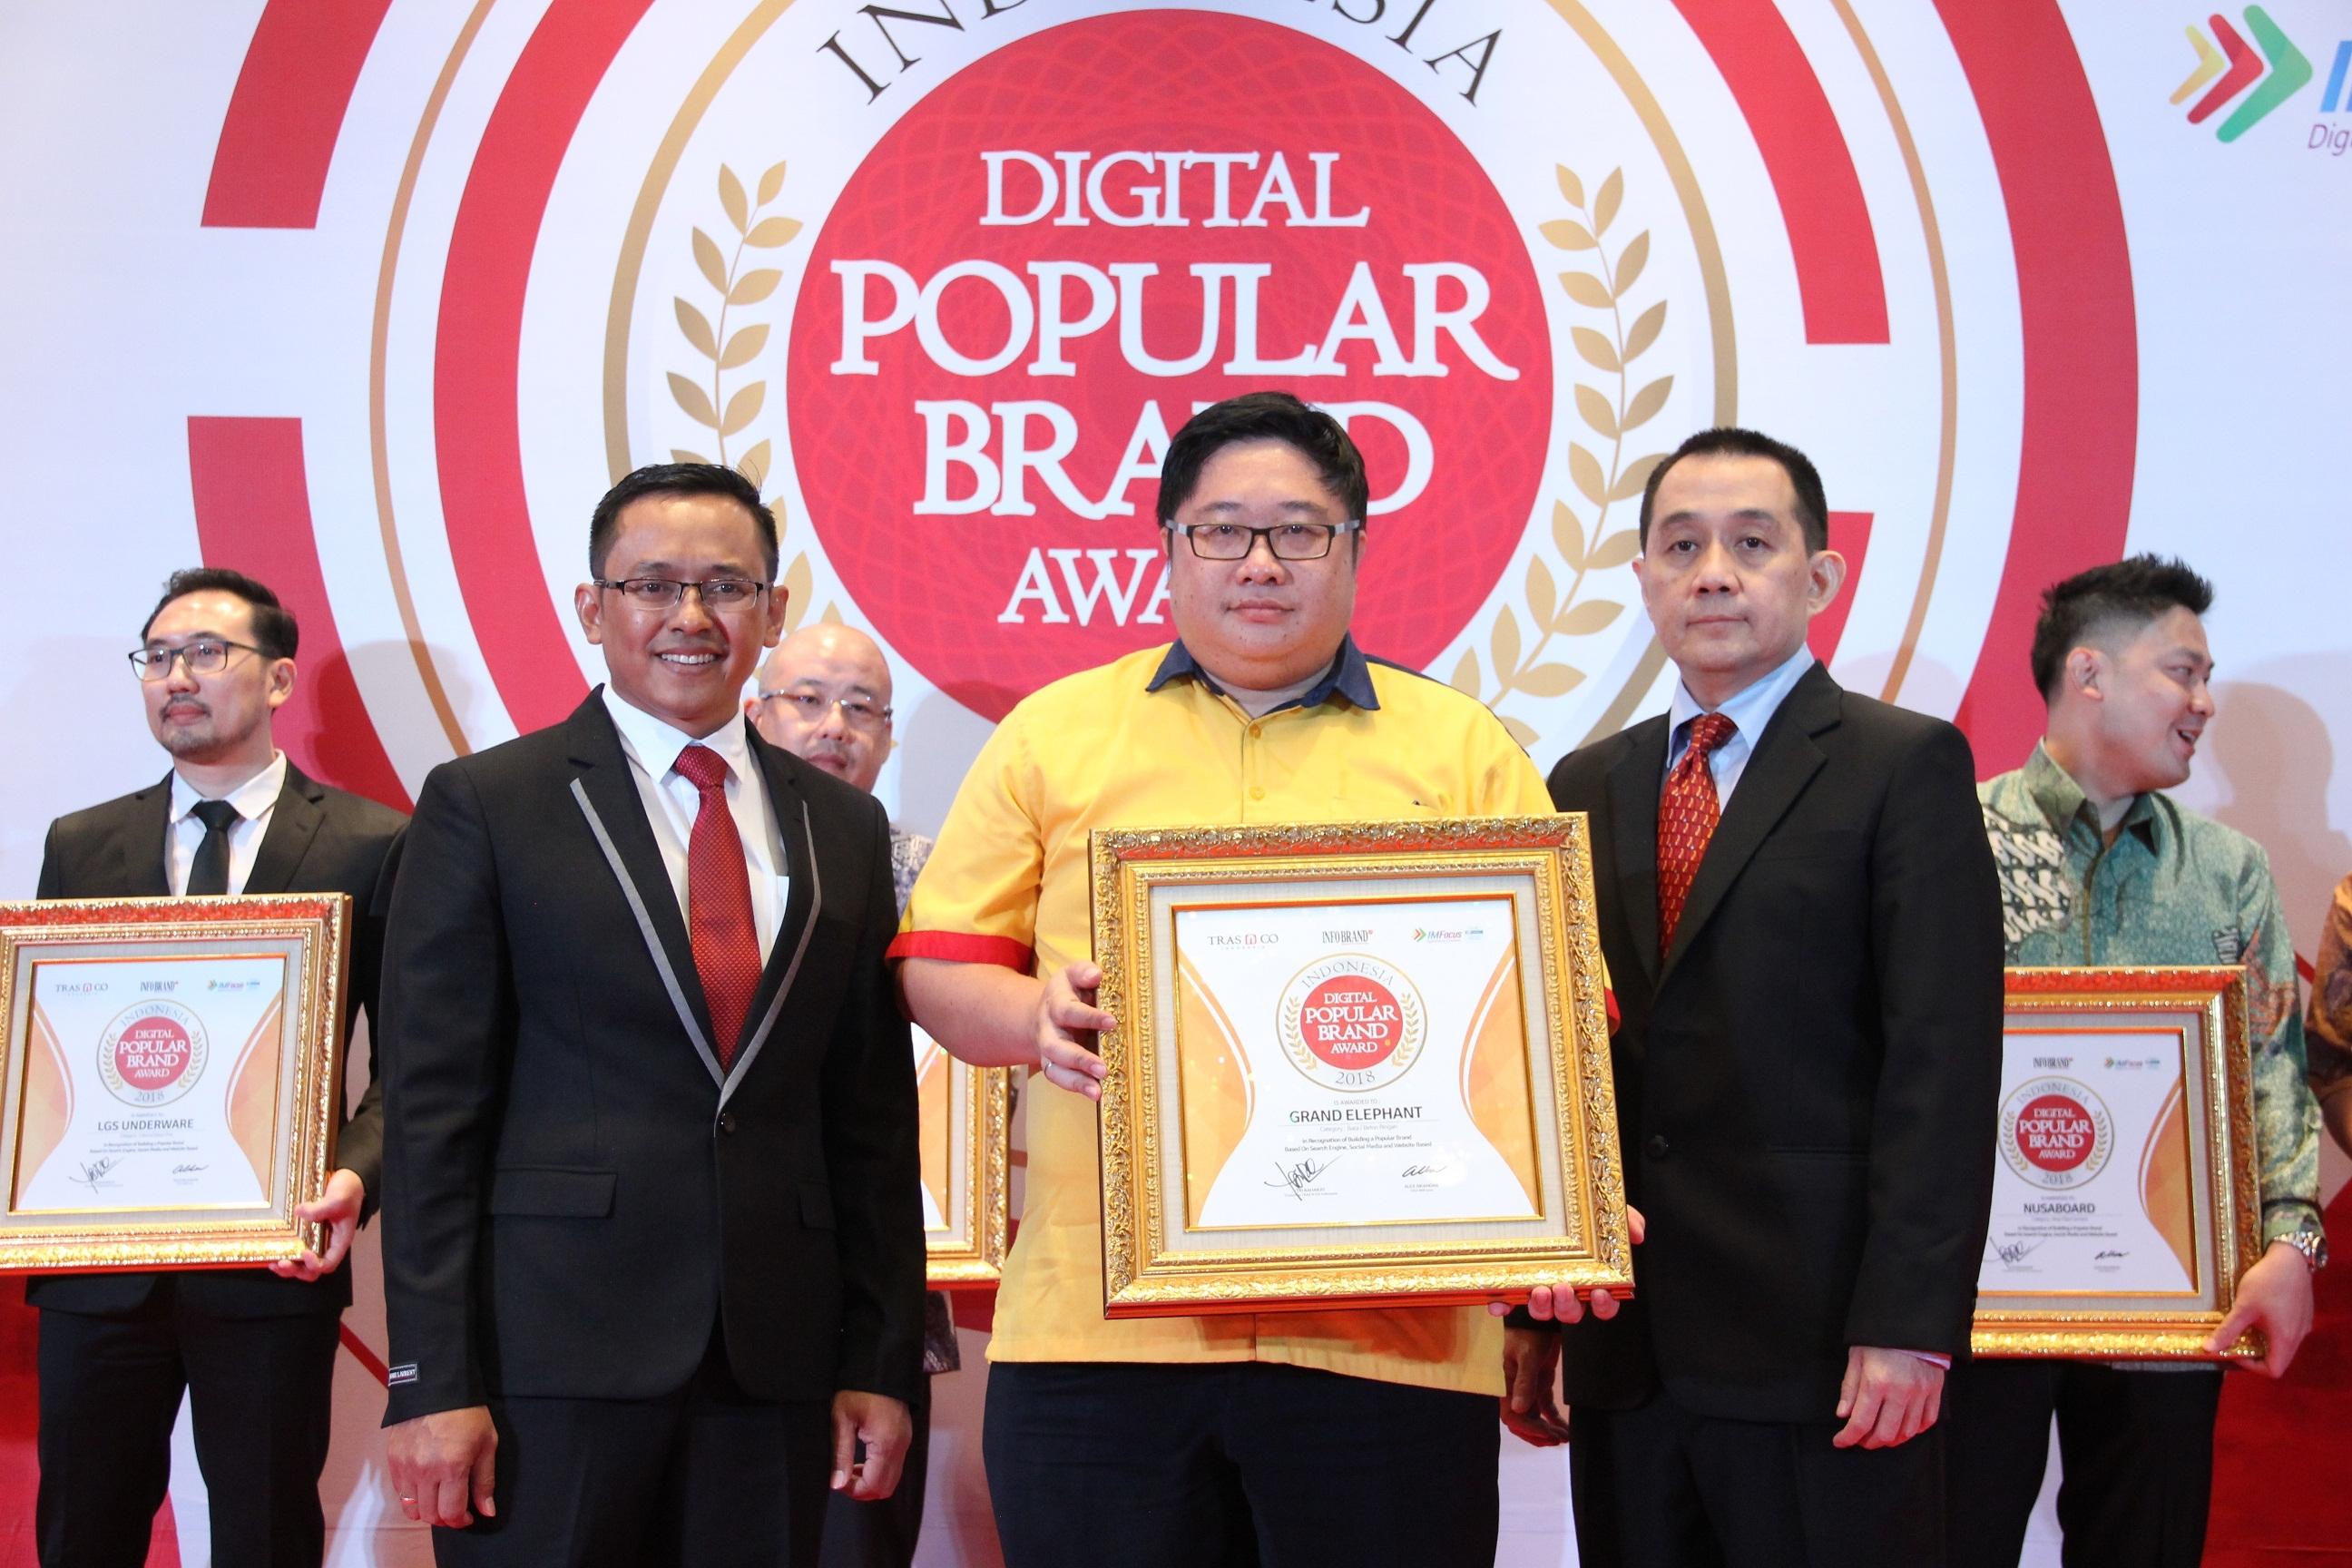 Grand Elephant Buktikan Mampu Kantongi Penghargaan Indonesia Digital Popular Brand Award 2018